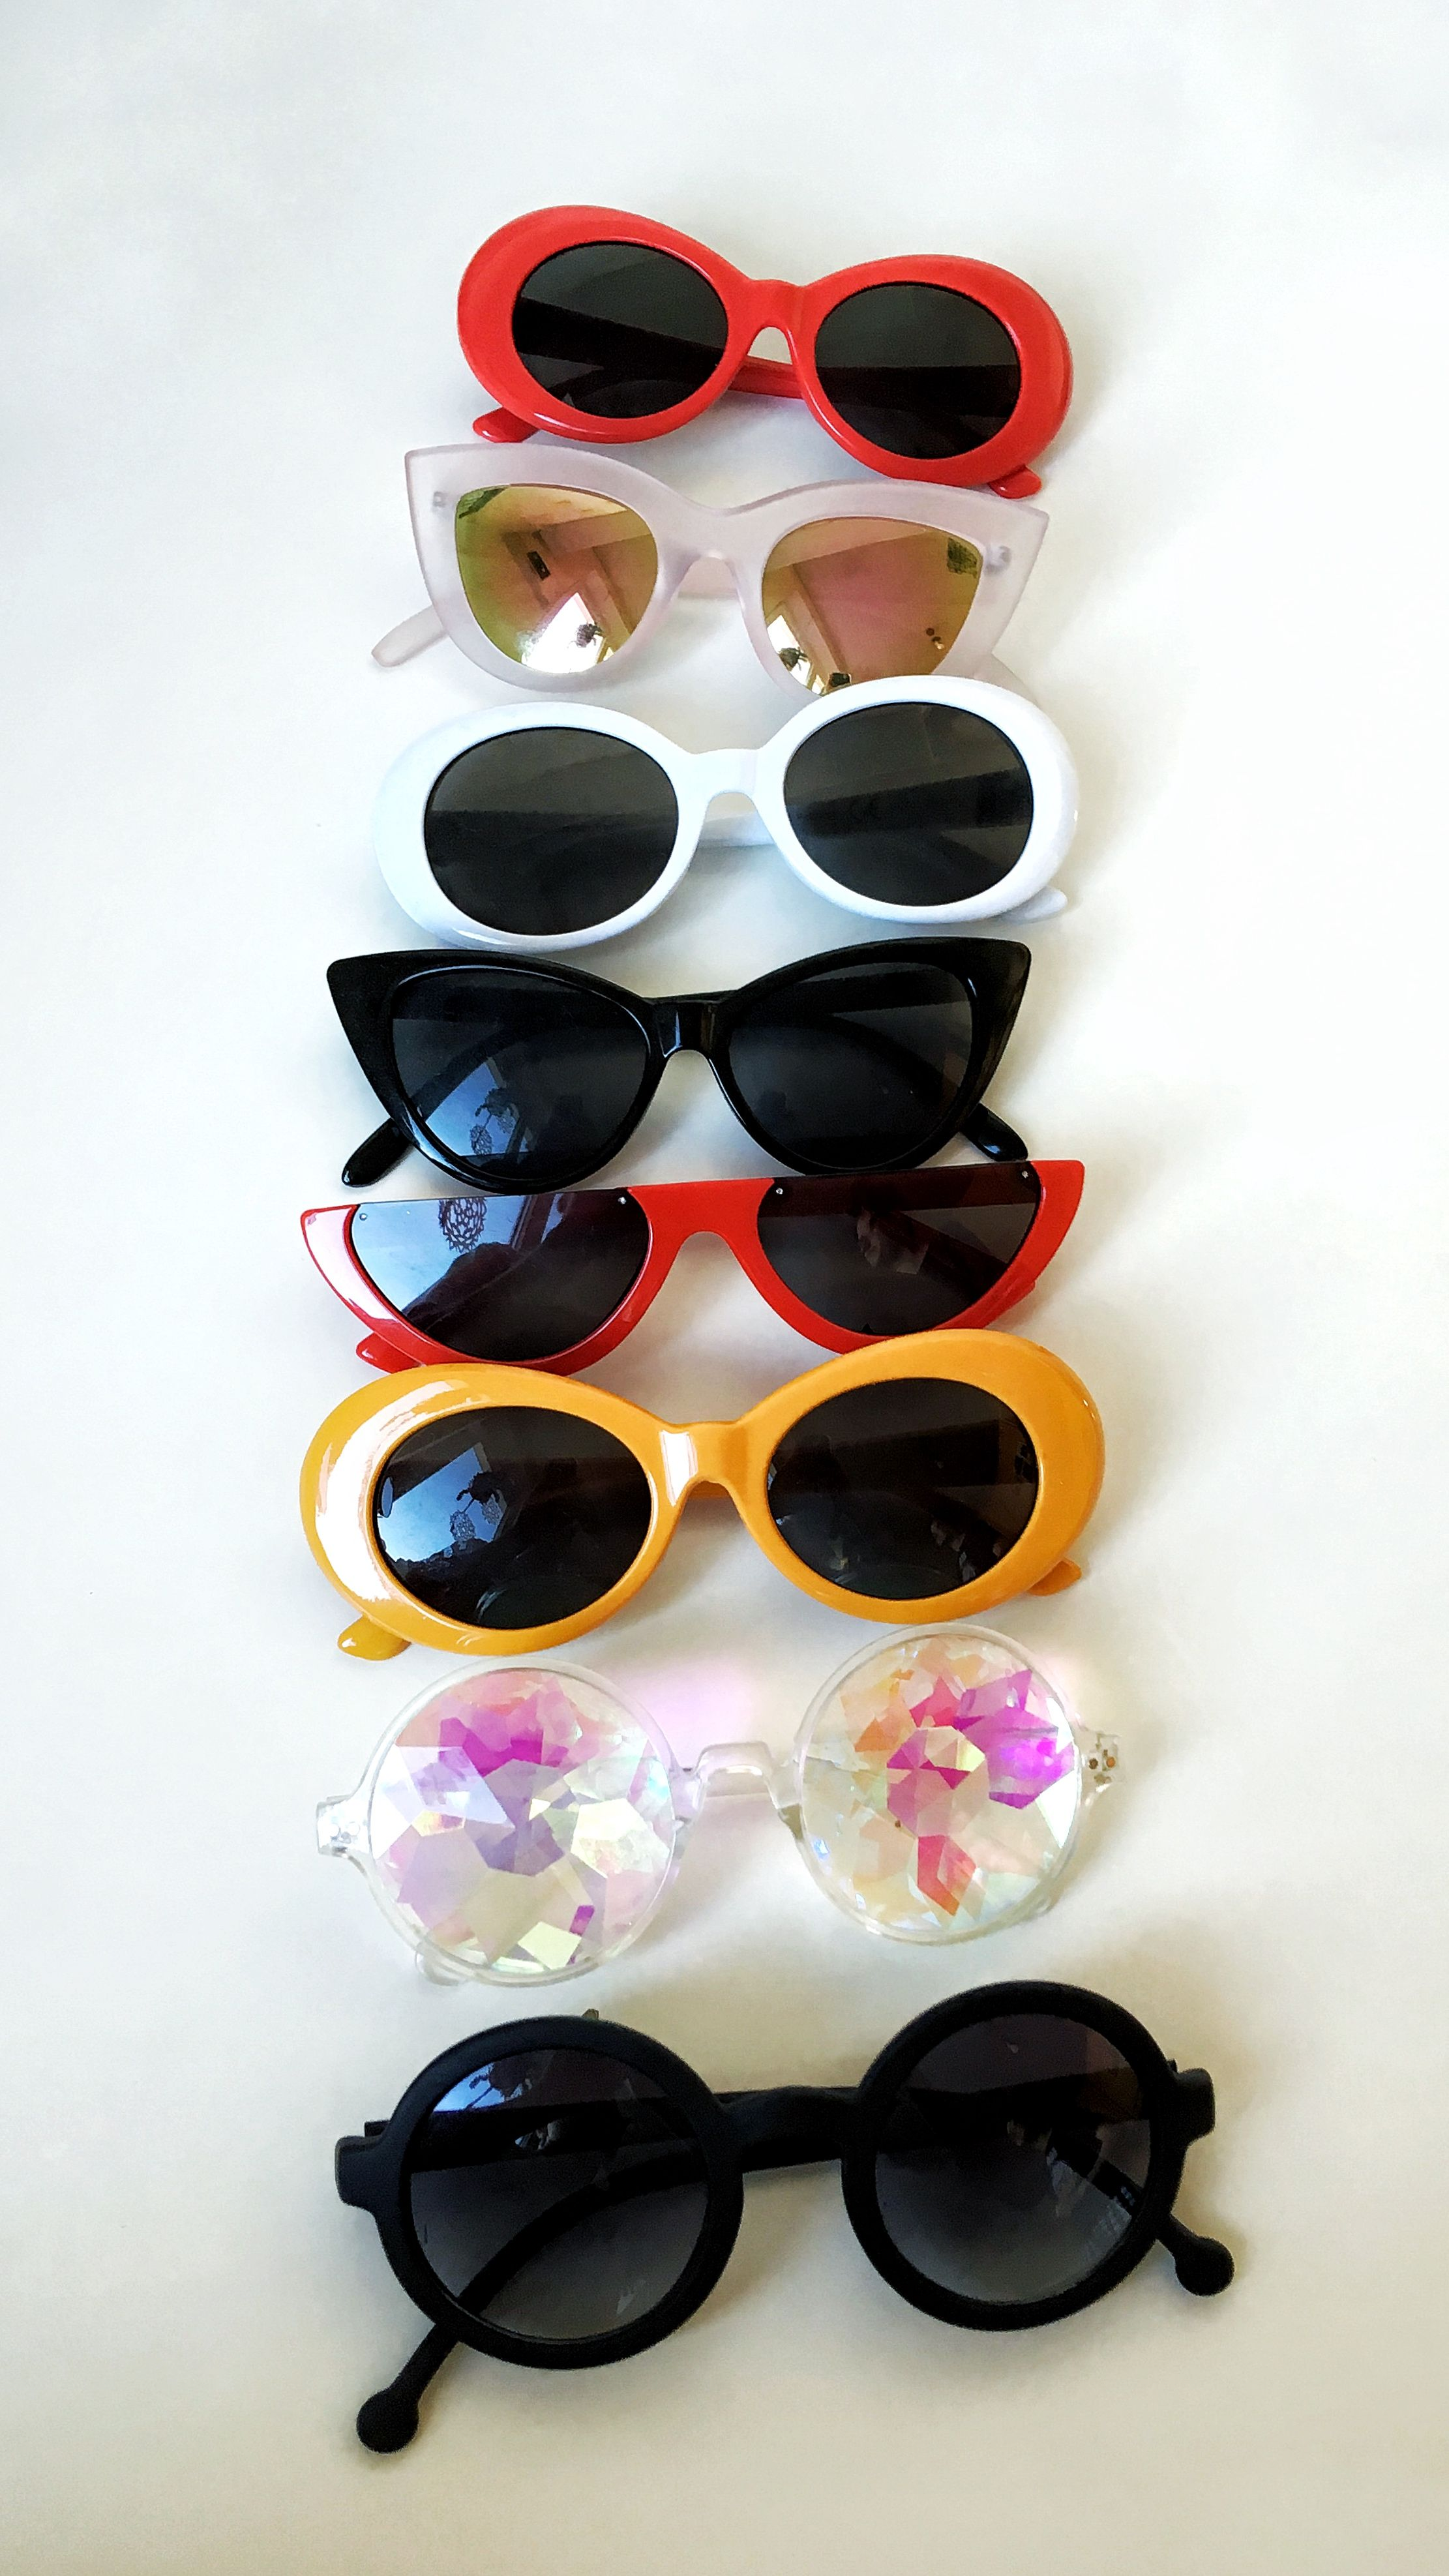 sunglasses  kaleidoscope  kaleidoscopesunglasses in 2019